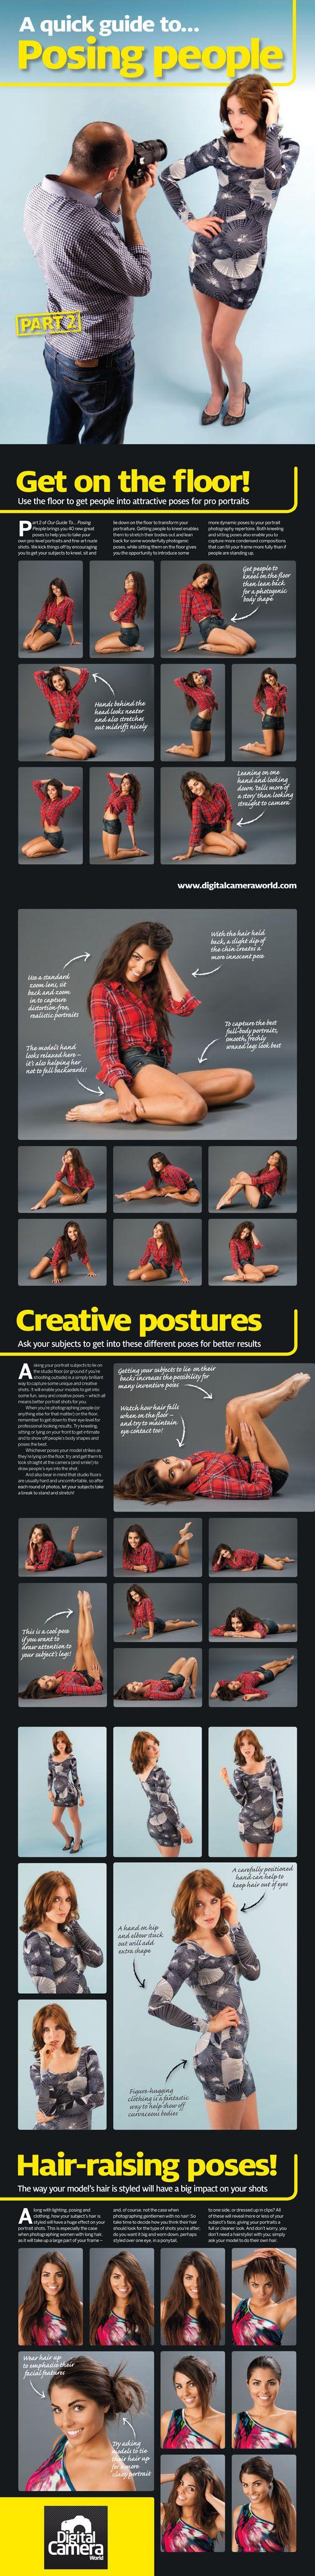 40 More Portrait Photography Ideas   Infographic